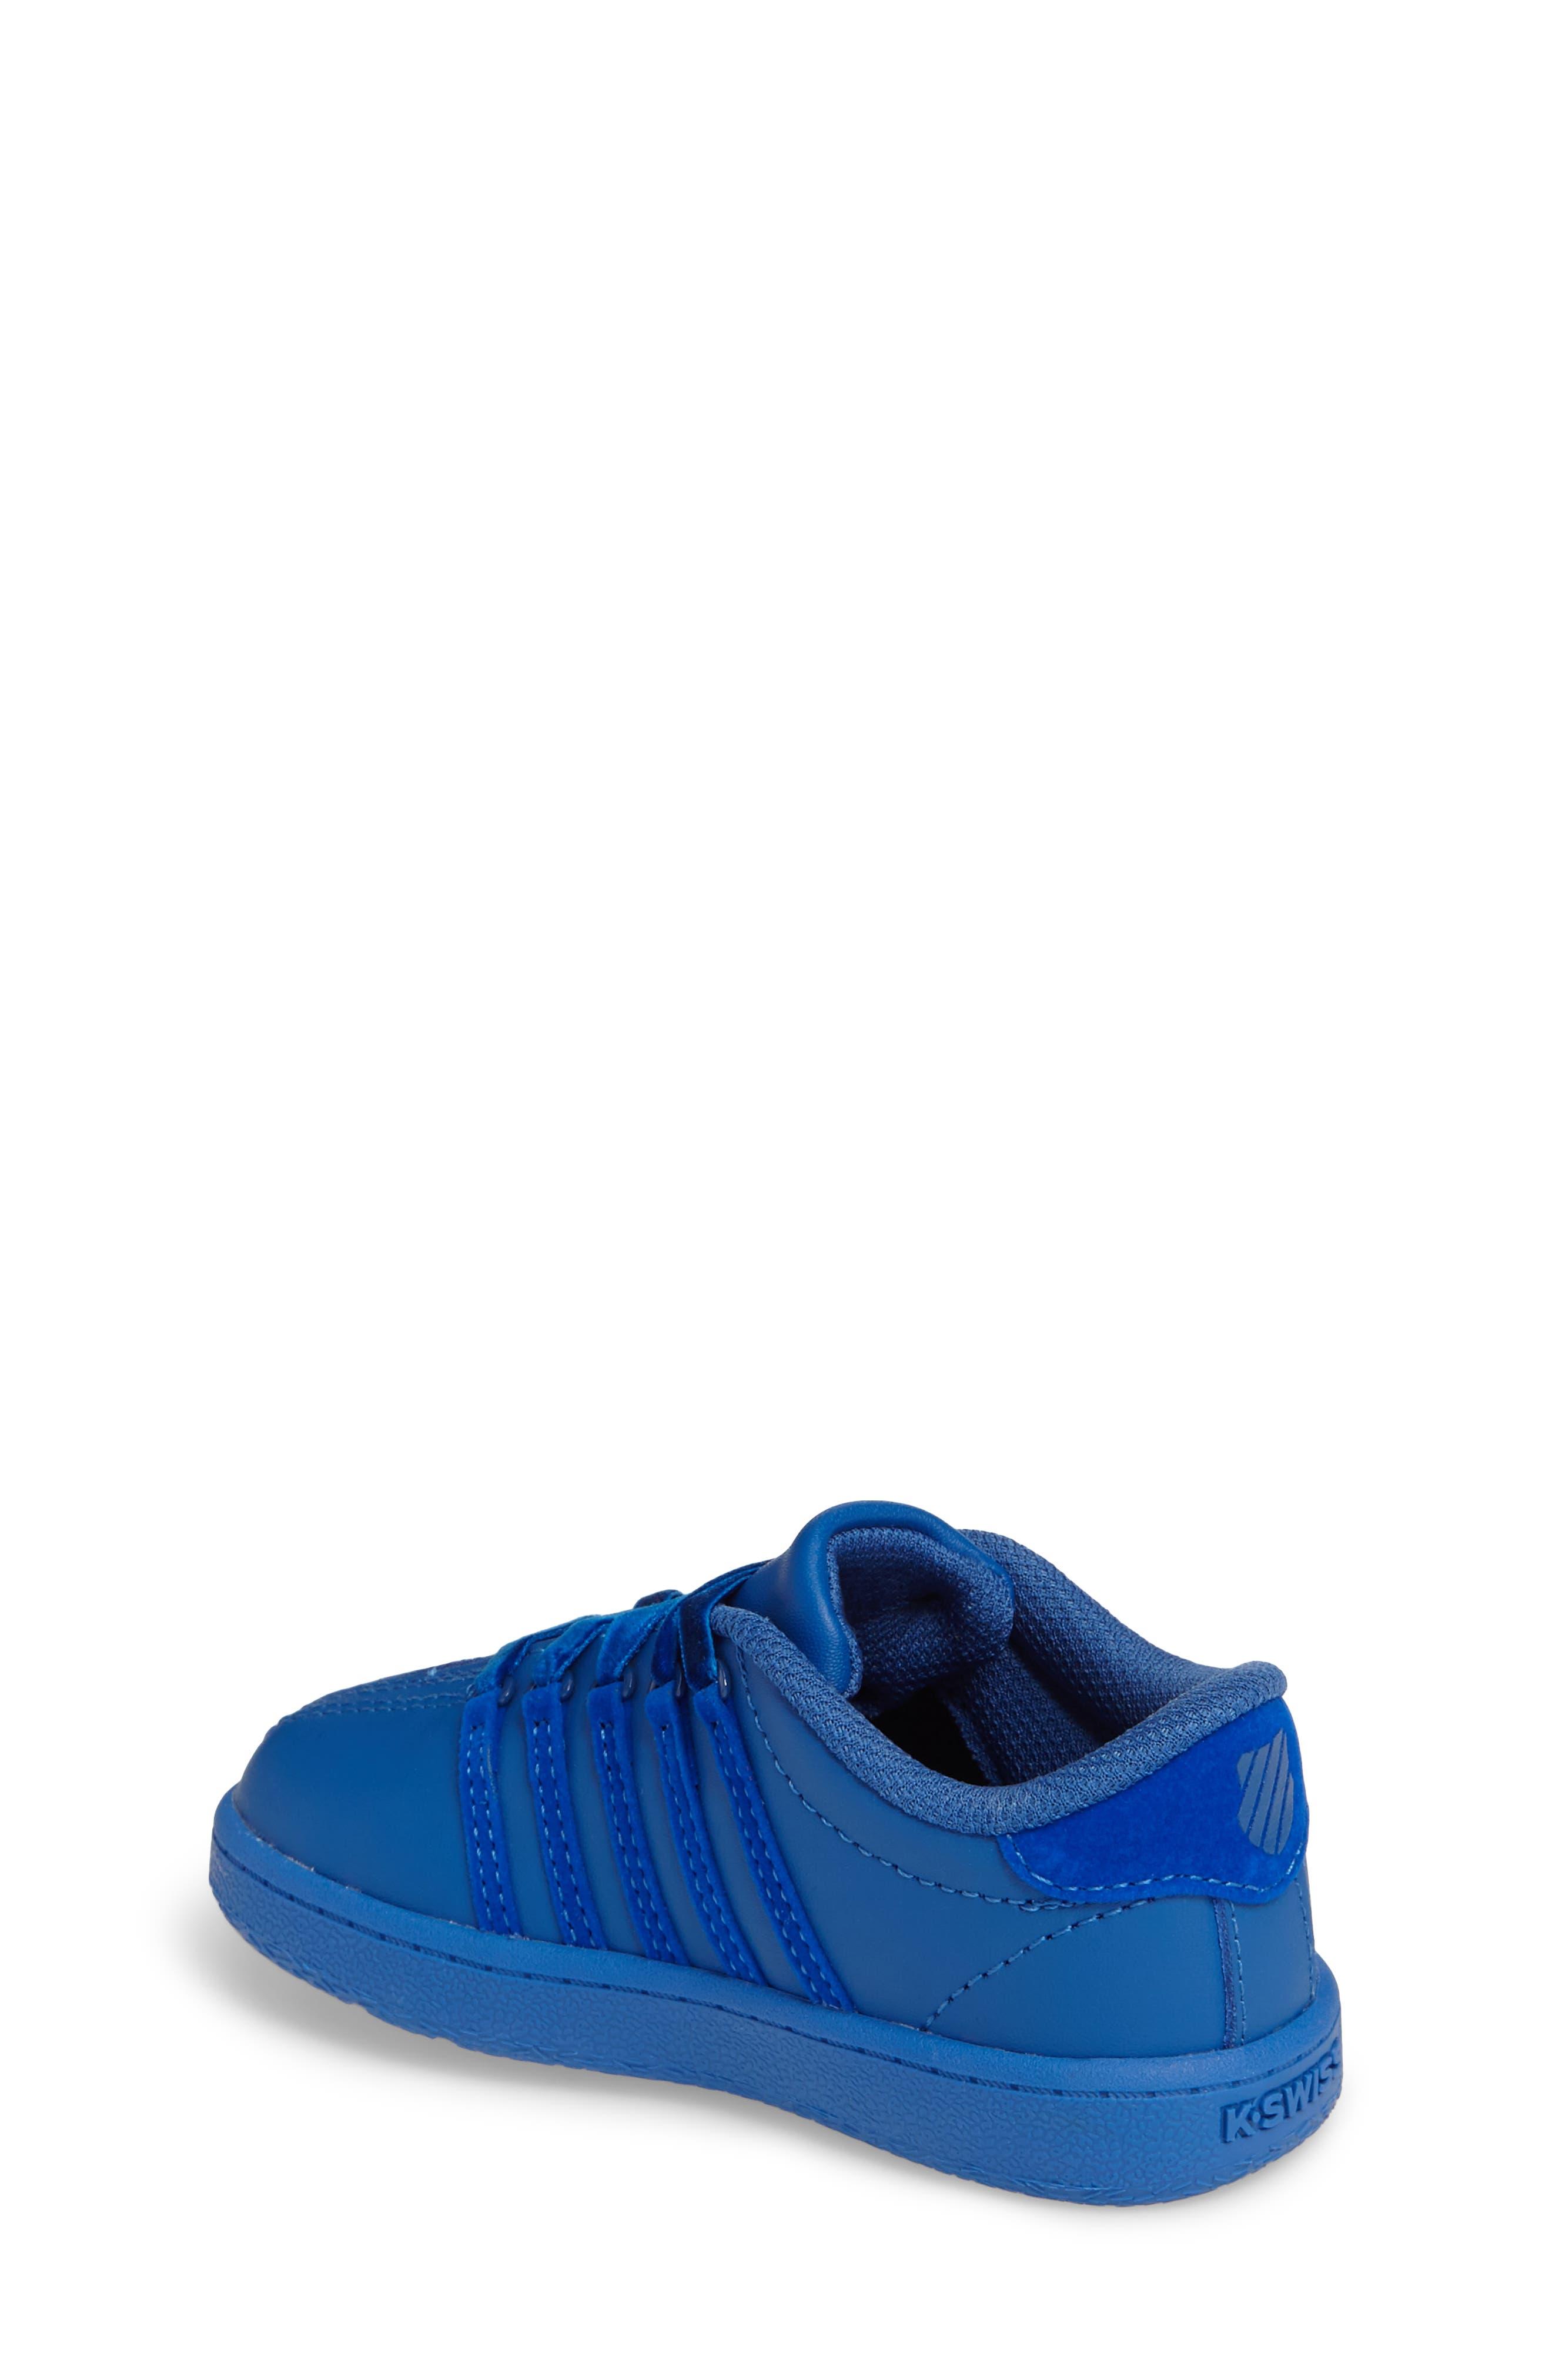 Classic VN Sneaker,                             Alternate thumbnail 6, color,